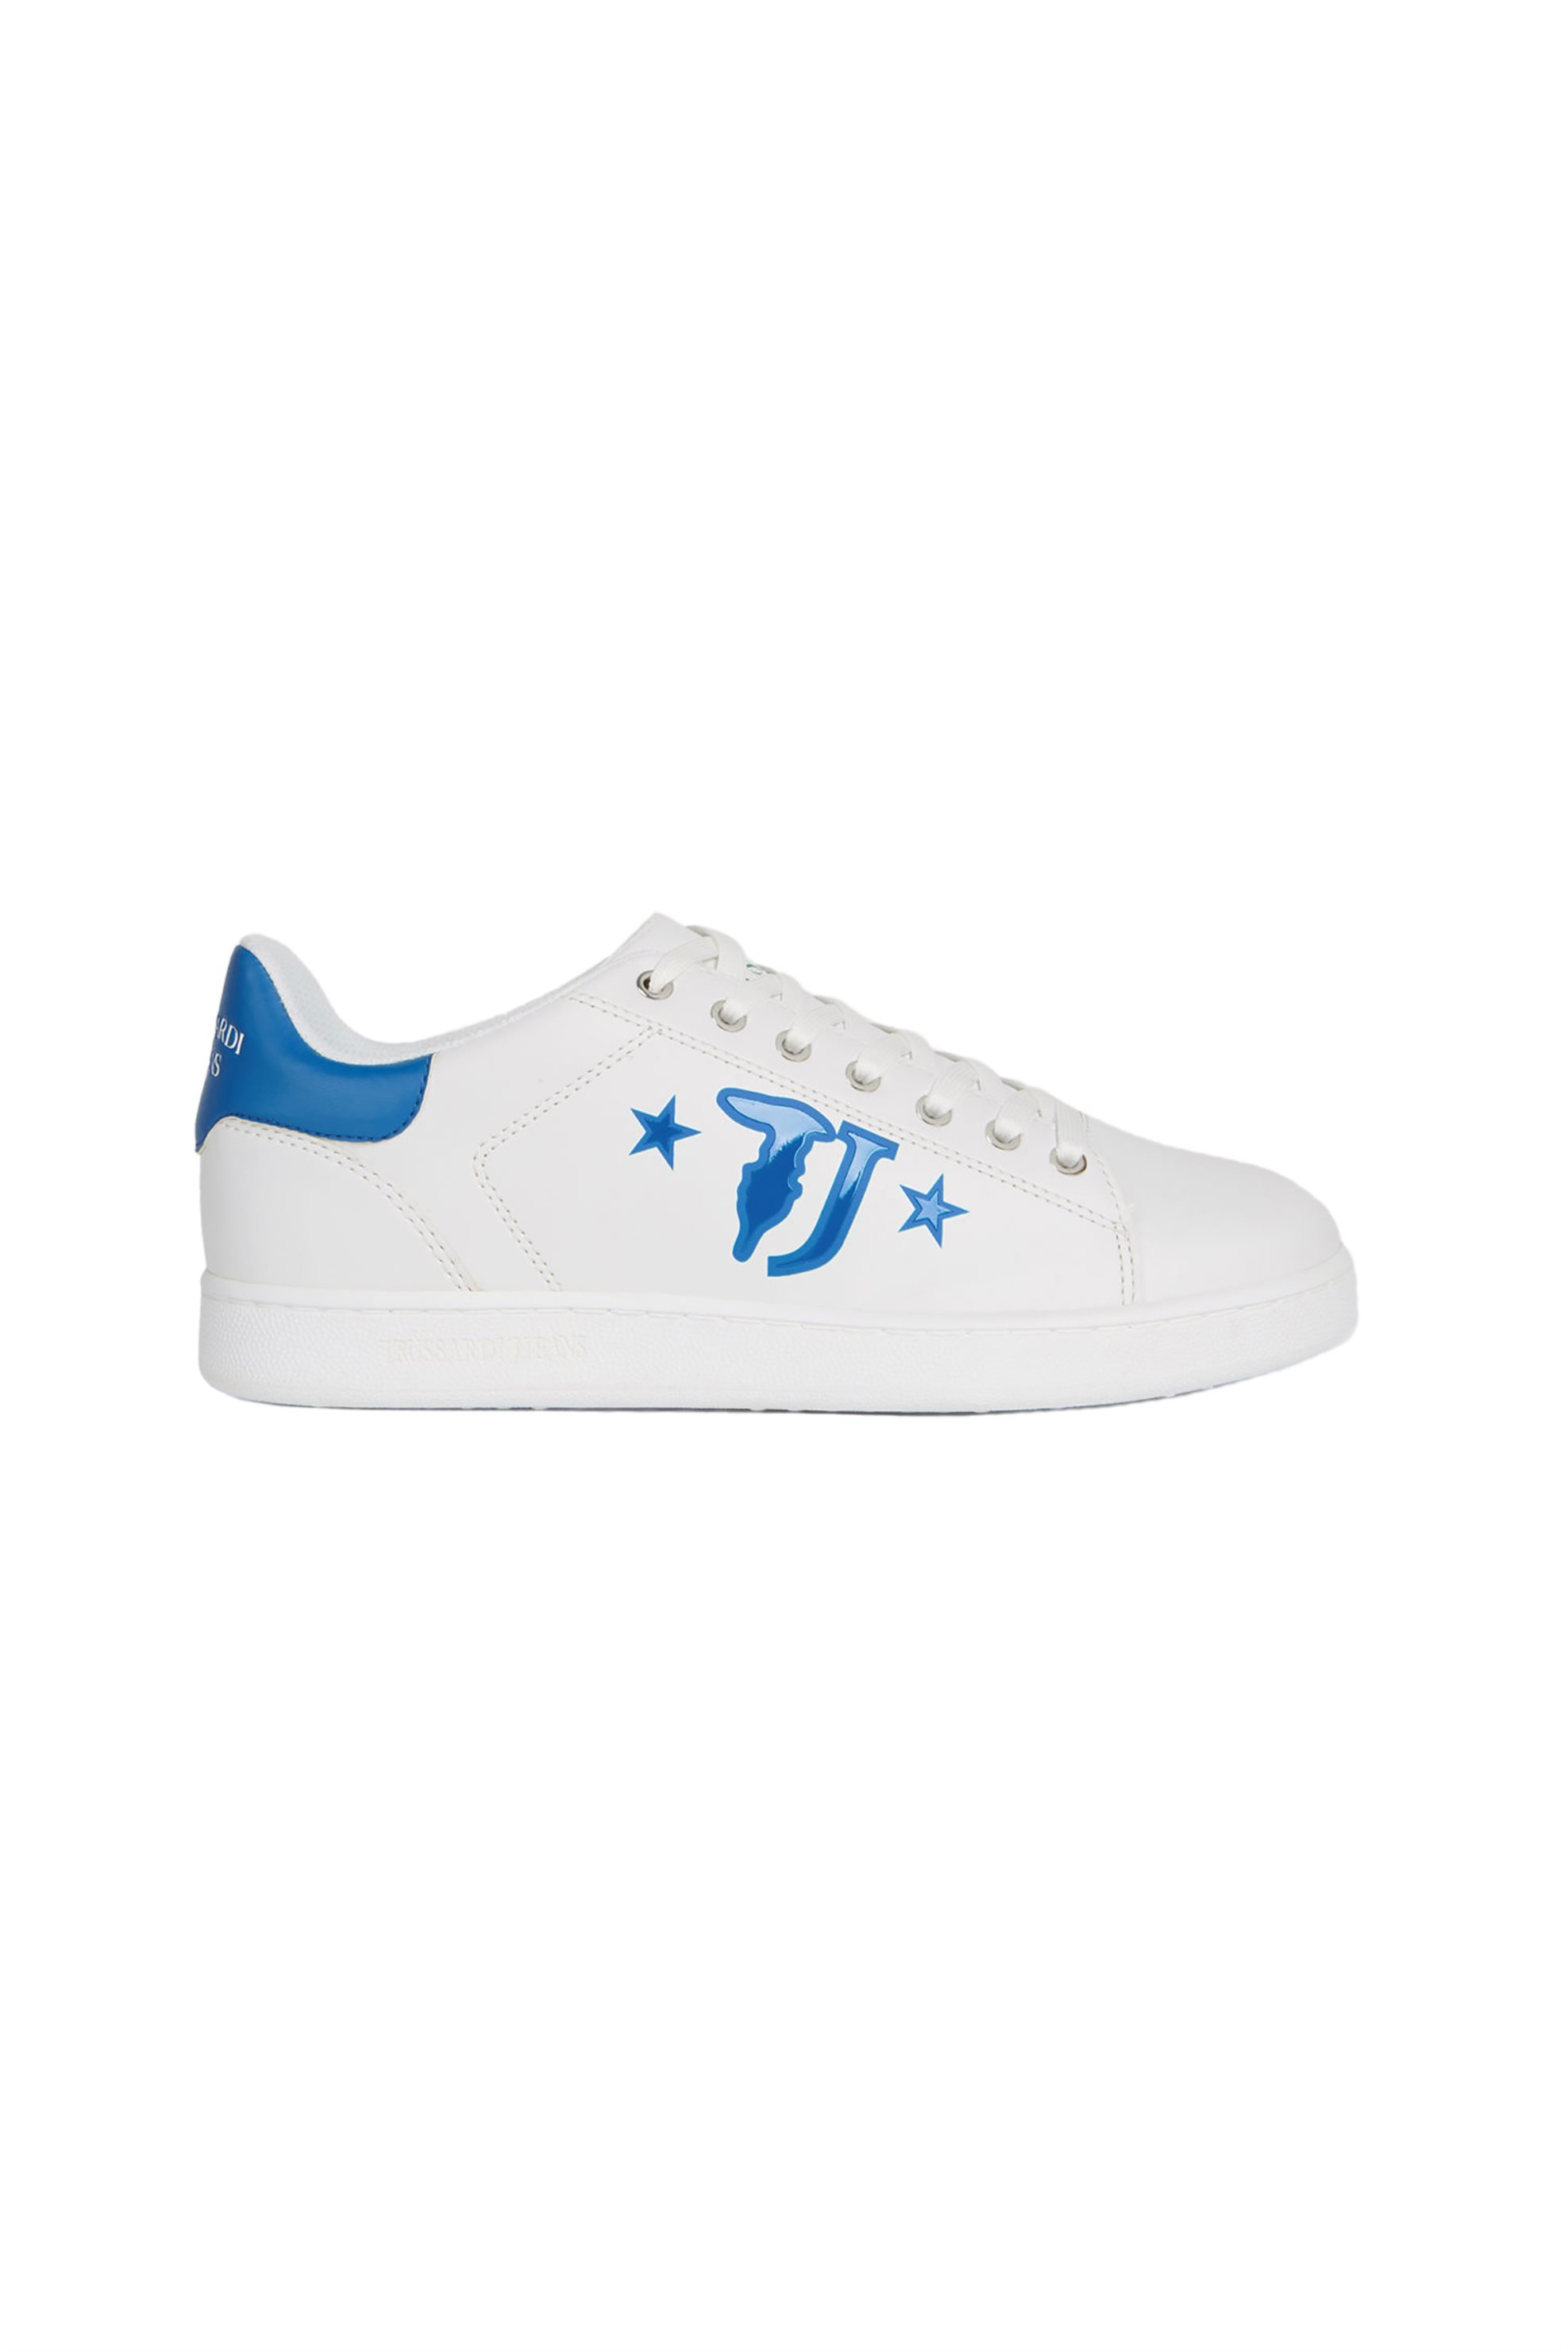 Trussardi ανδρικά sneakers με brand logo print στο πλάι – 77A00173-9Y099999 – Μπλε Σκούρο